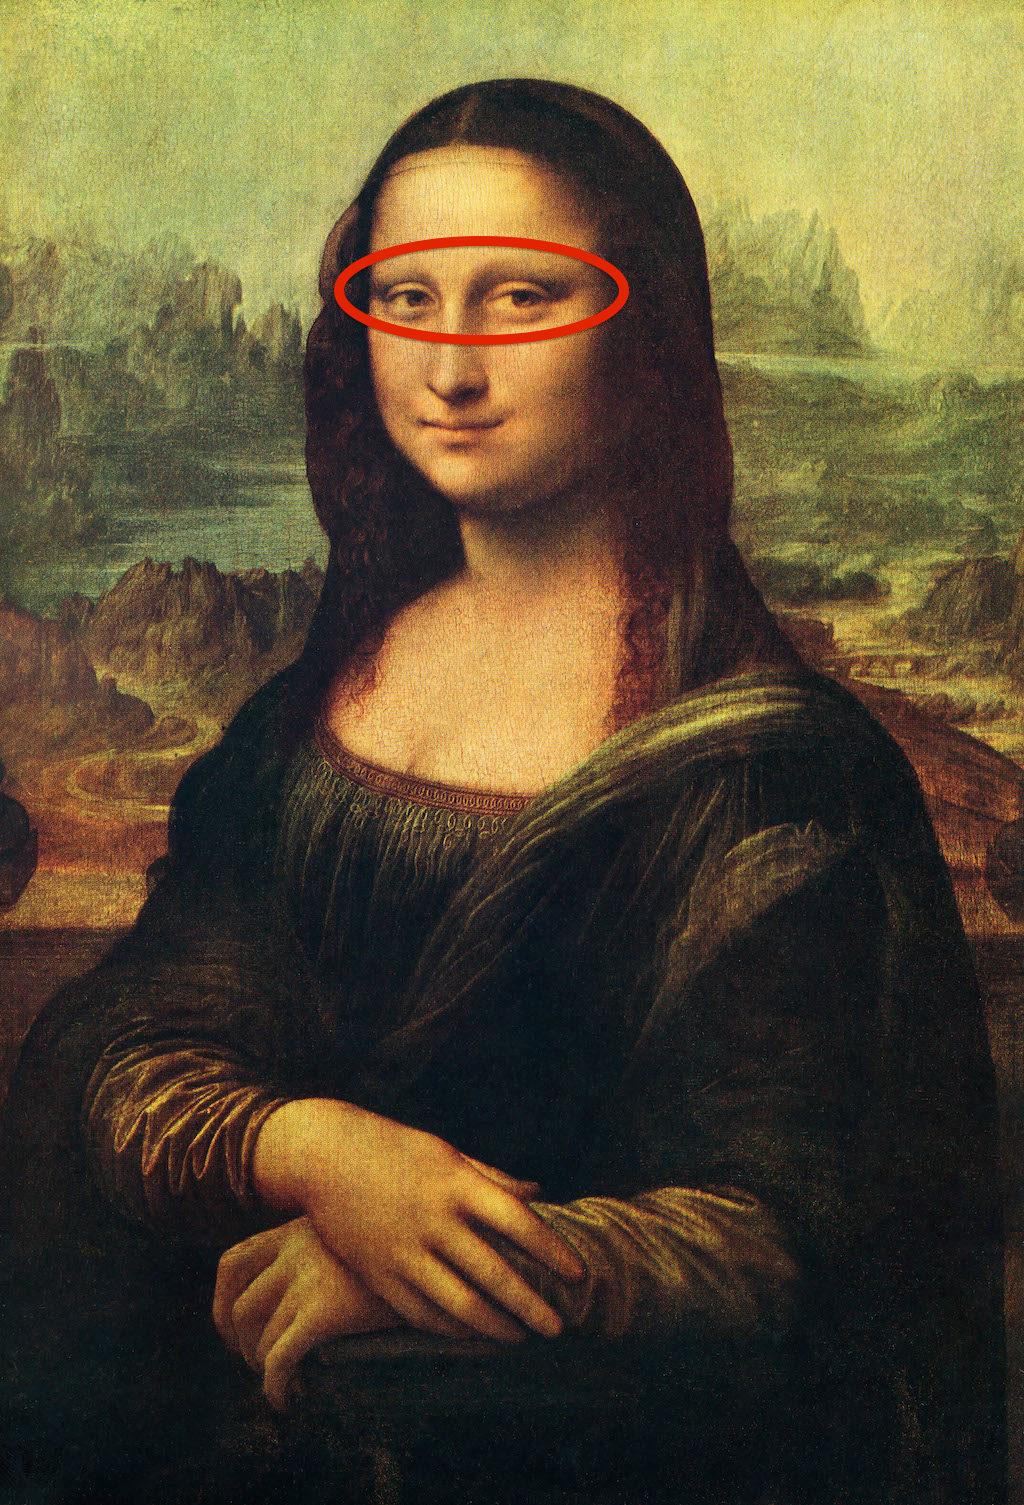 BPFPDX Mona Lisa by Leonardo da Vinci.